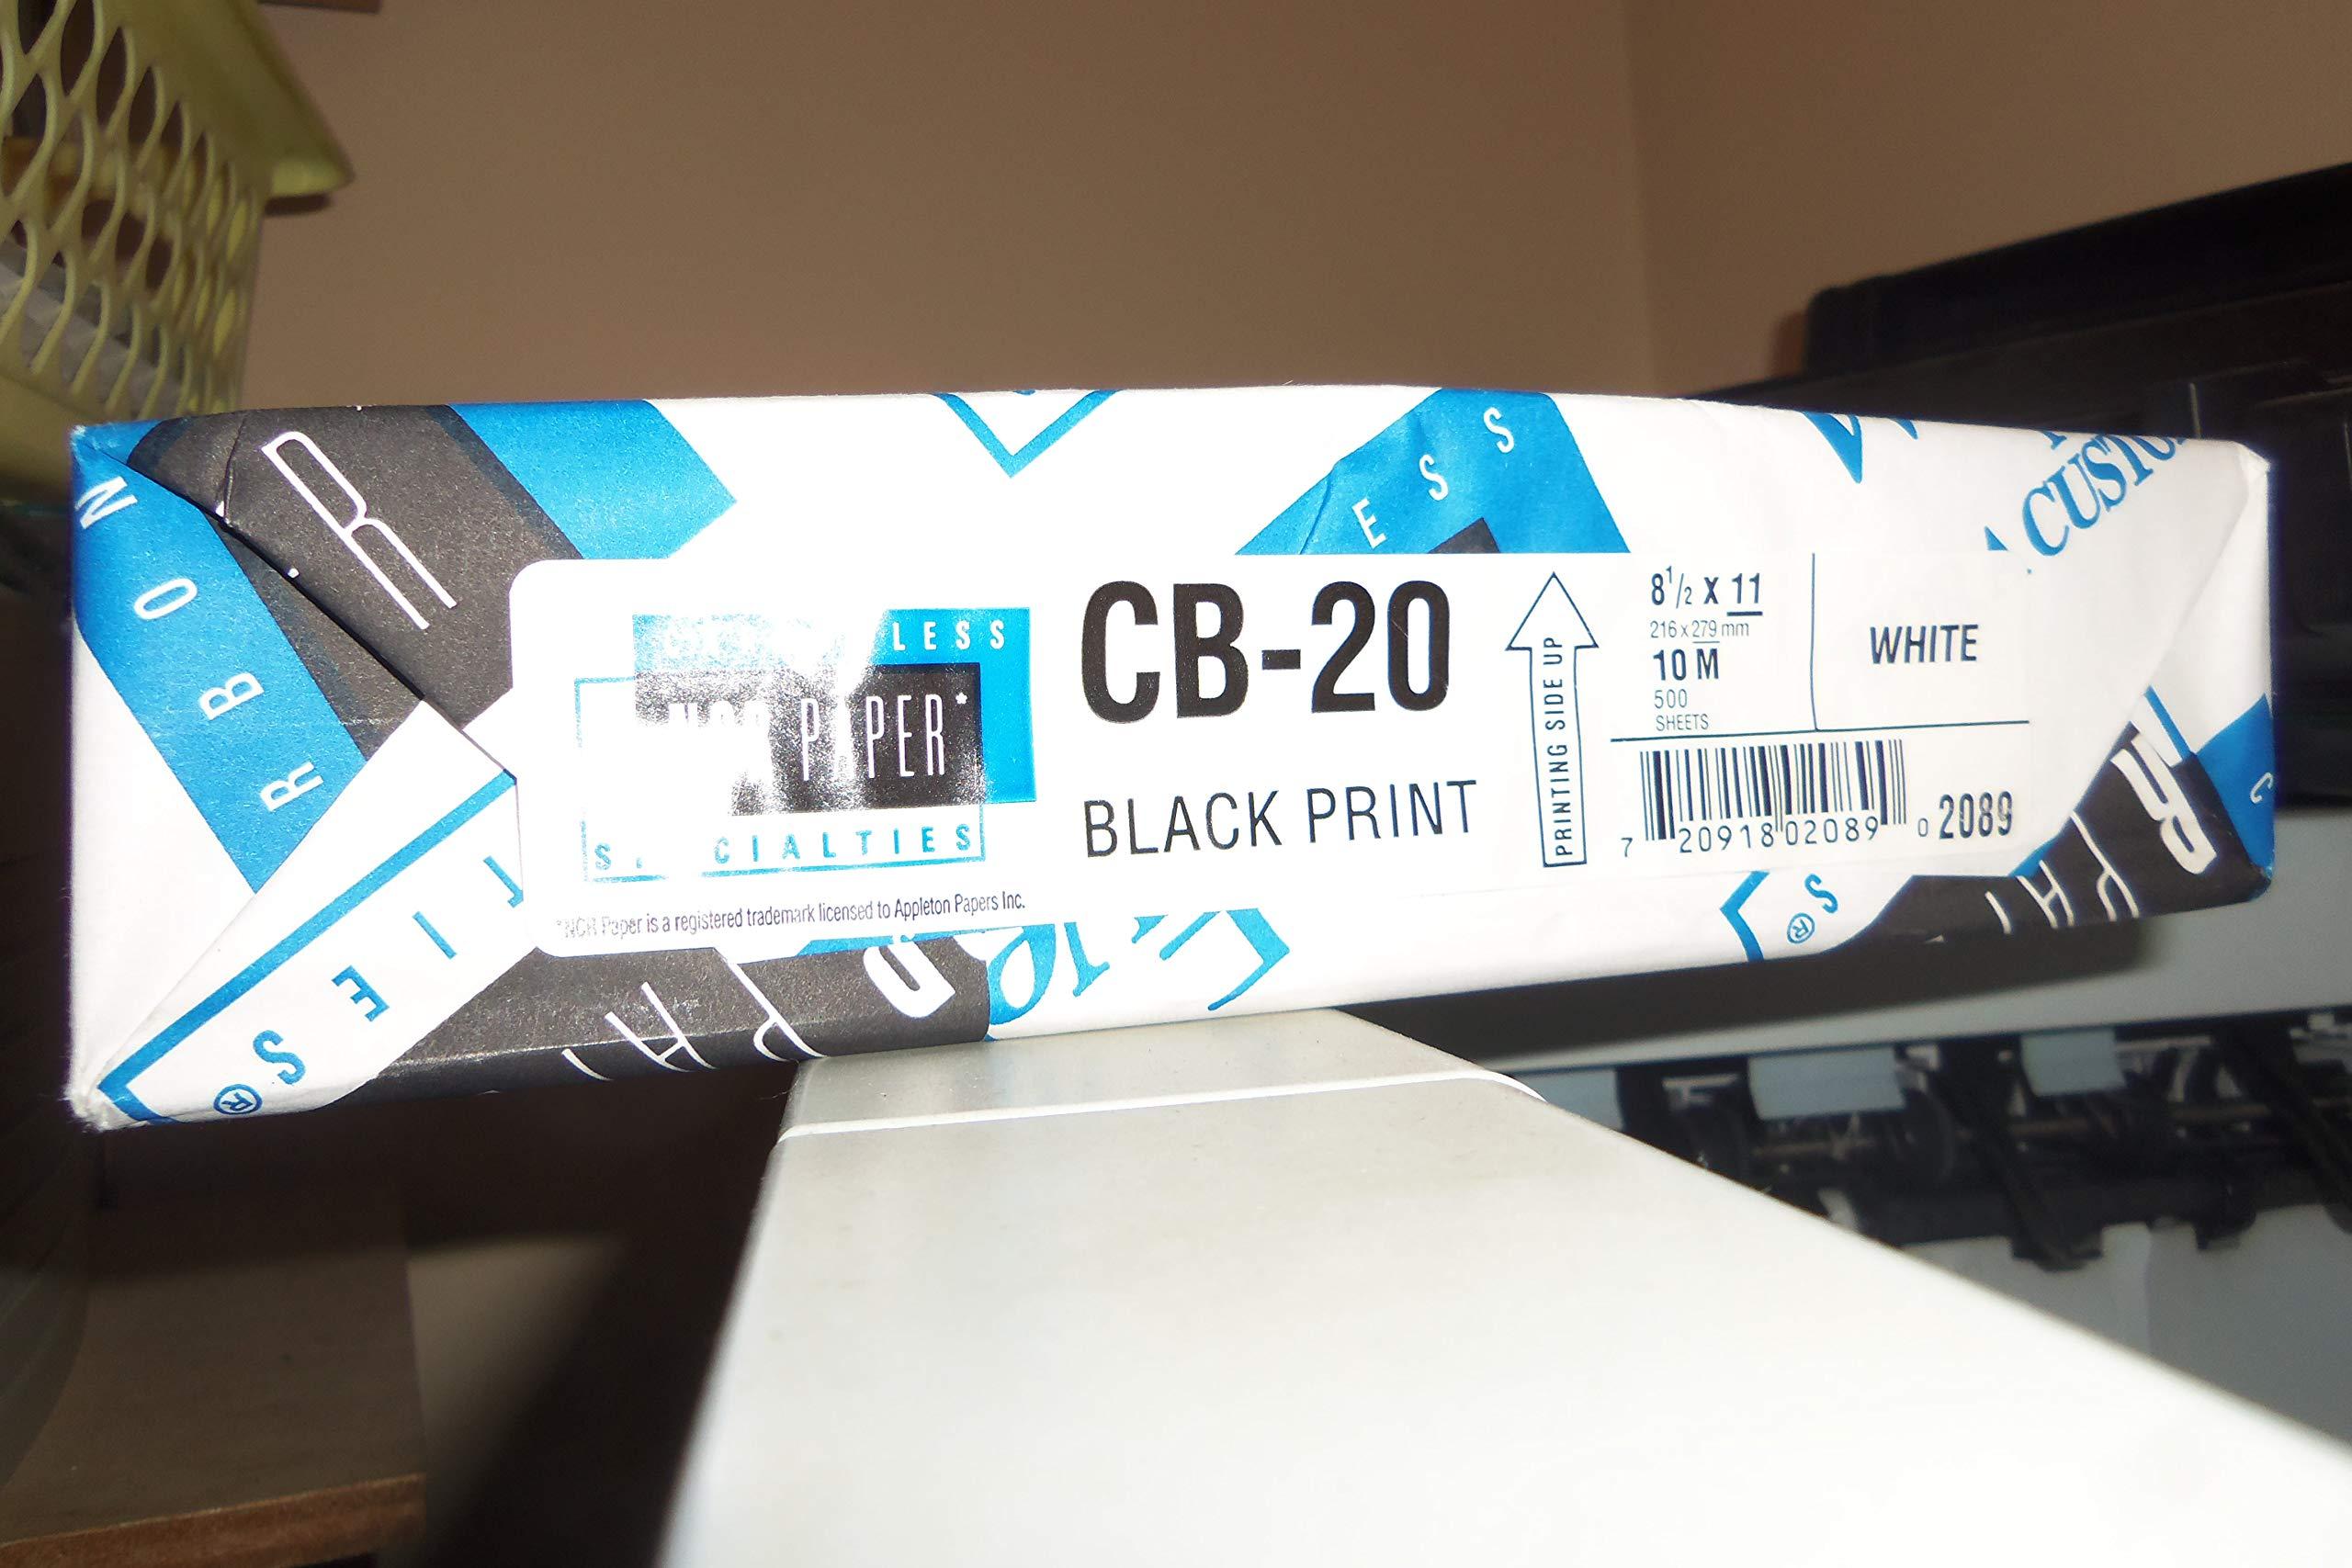 NCR Paper* Brand Superior CB White Carbonless Paper - 8 1/2 x 11 in 21 lb Bond 500 per Ream